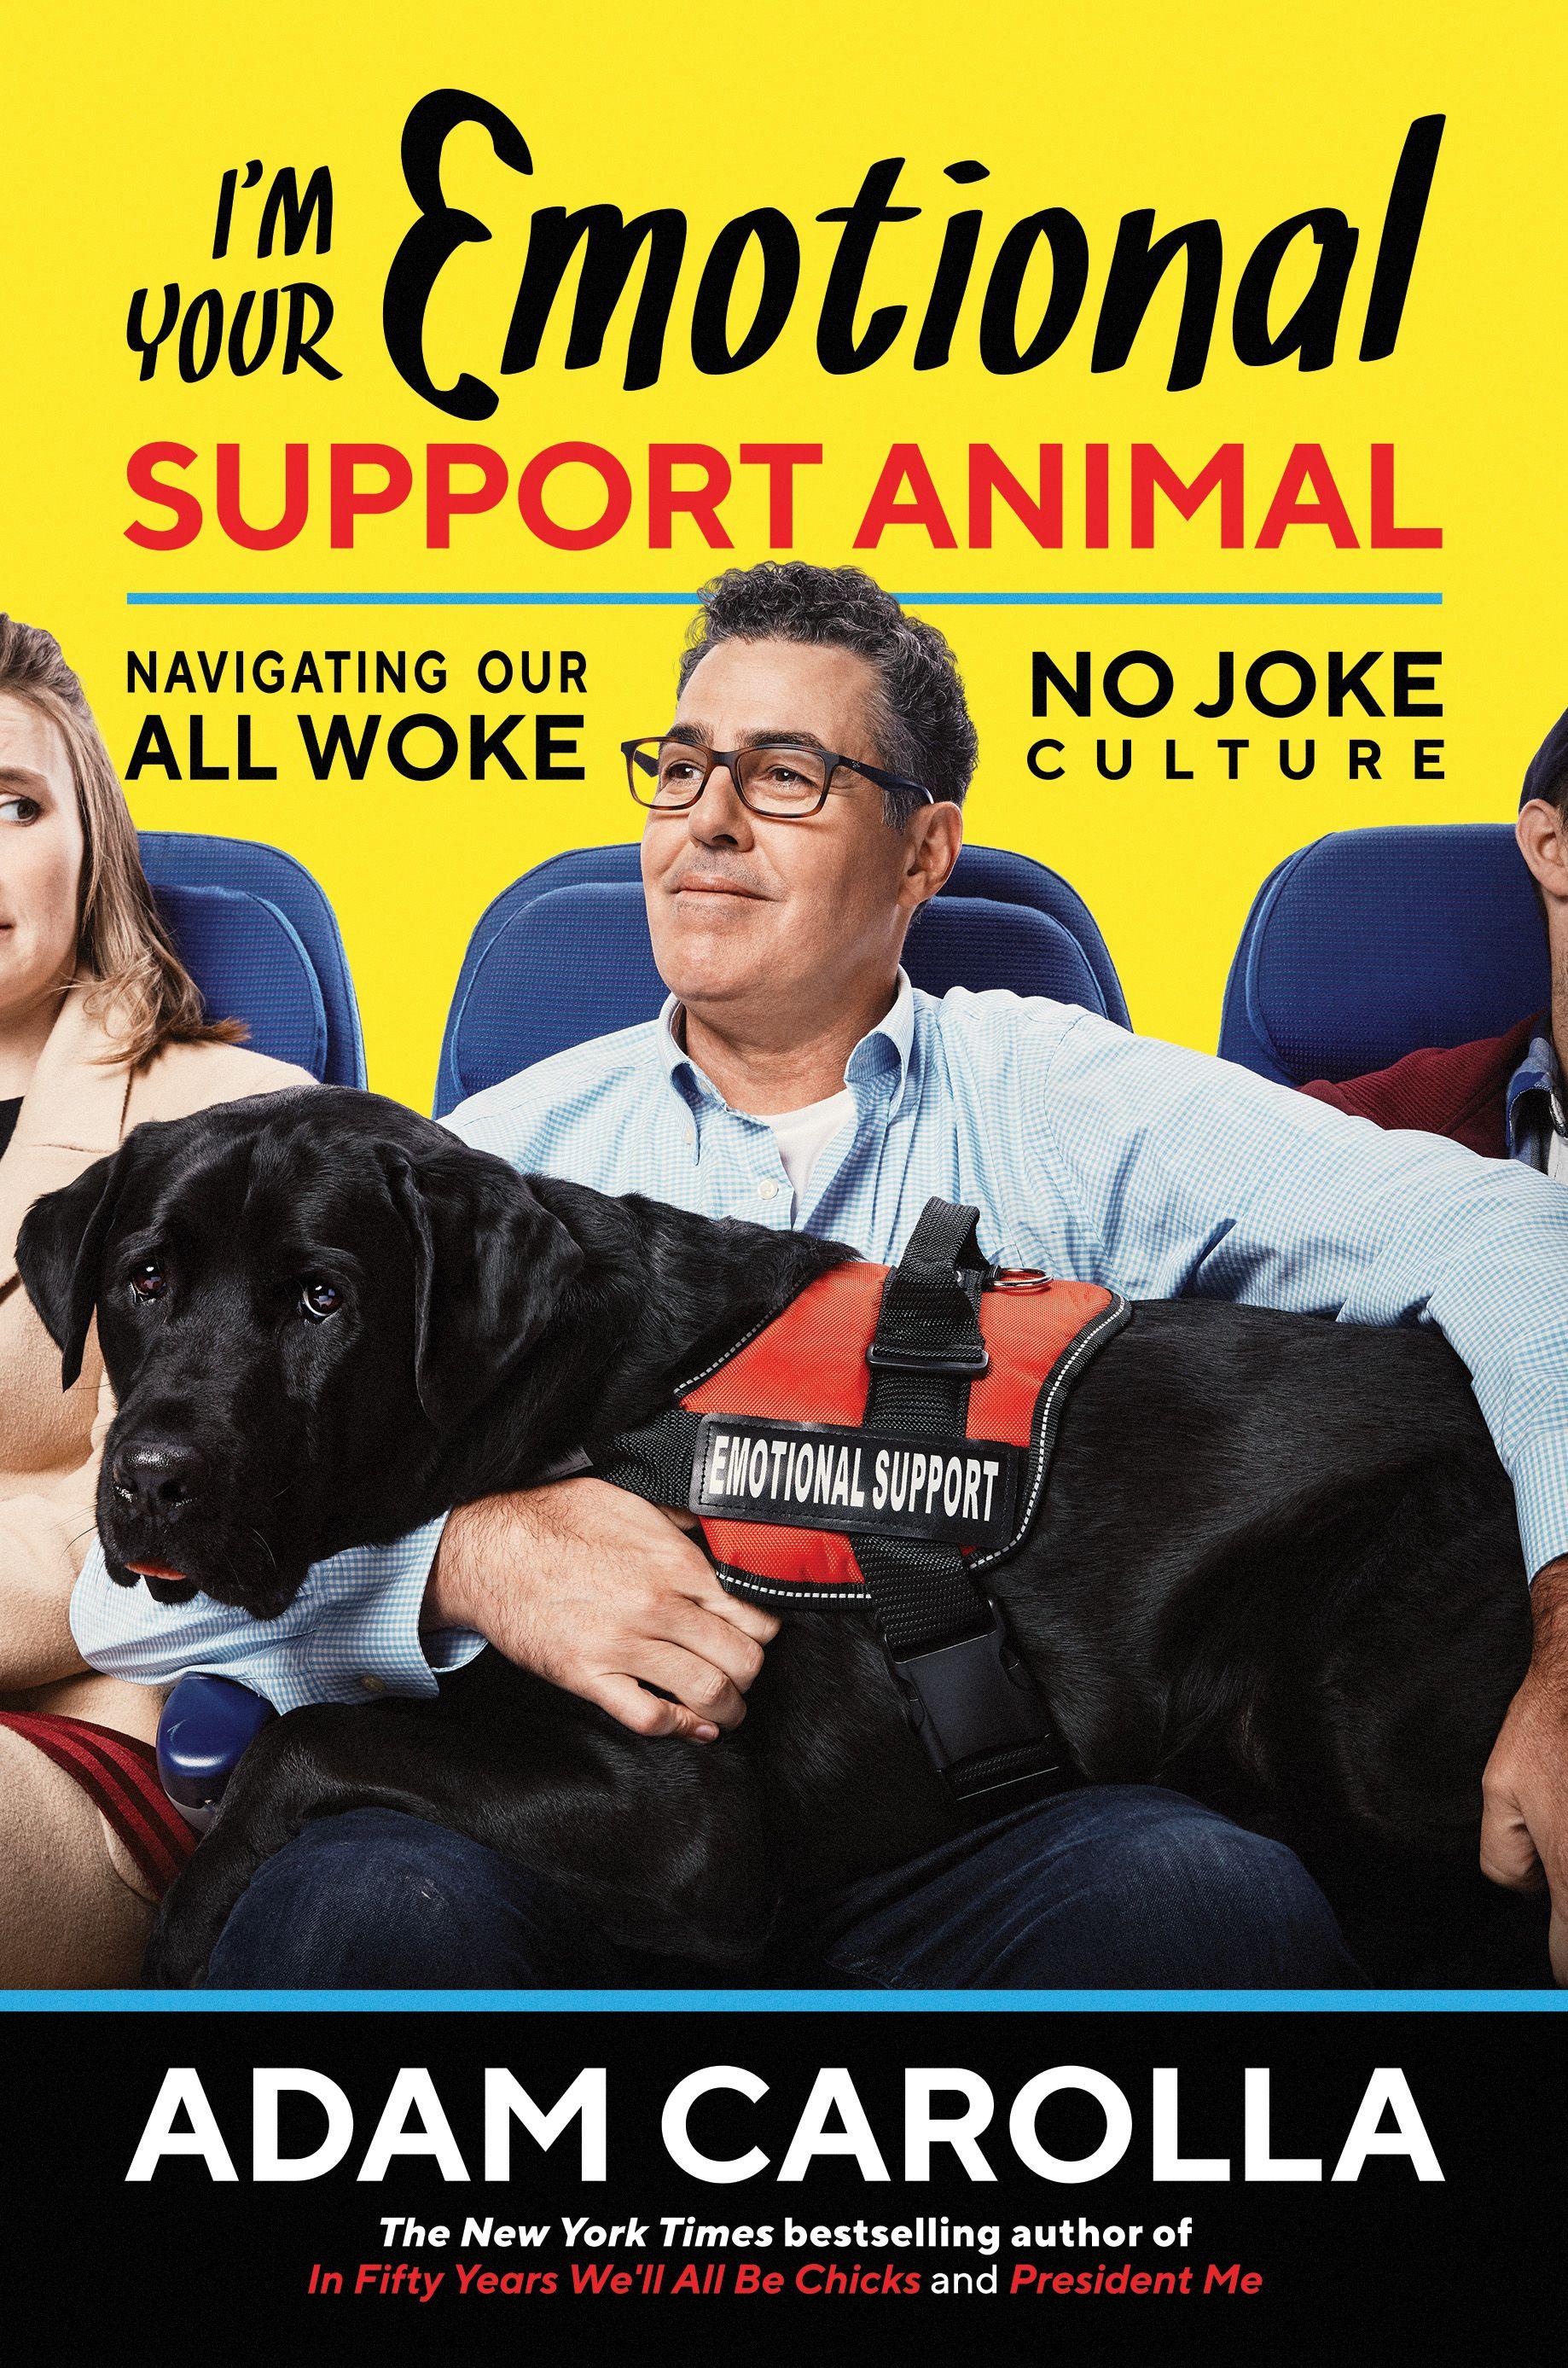 Download Pdf Books I M Your Emotional Support Animal Navigating Our All Woke No Joke Culture In 2020 Emotional Support Animal Emotional Support Support Animal